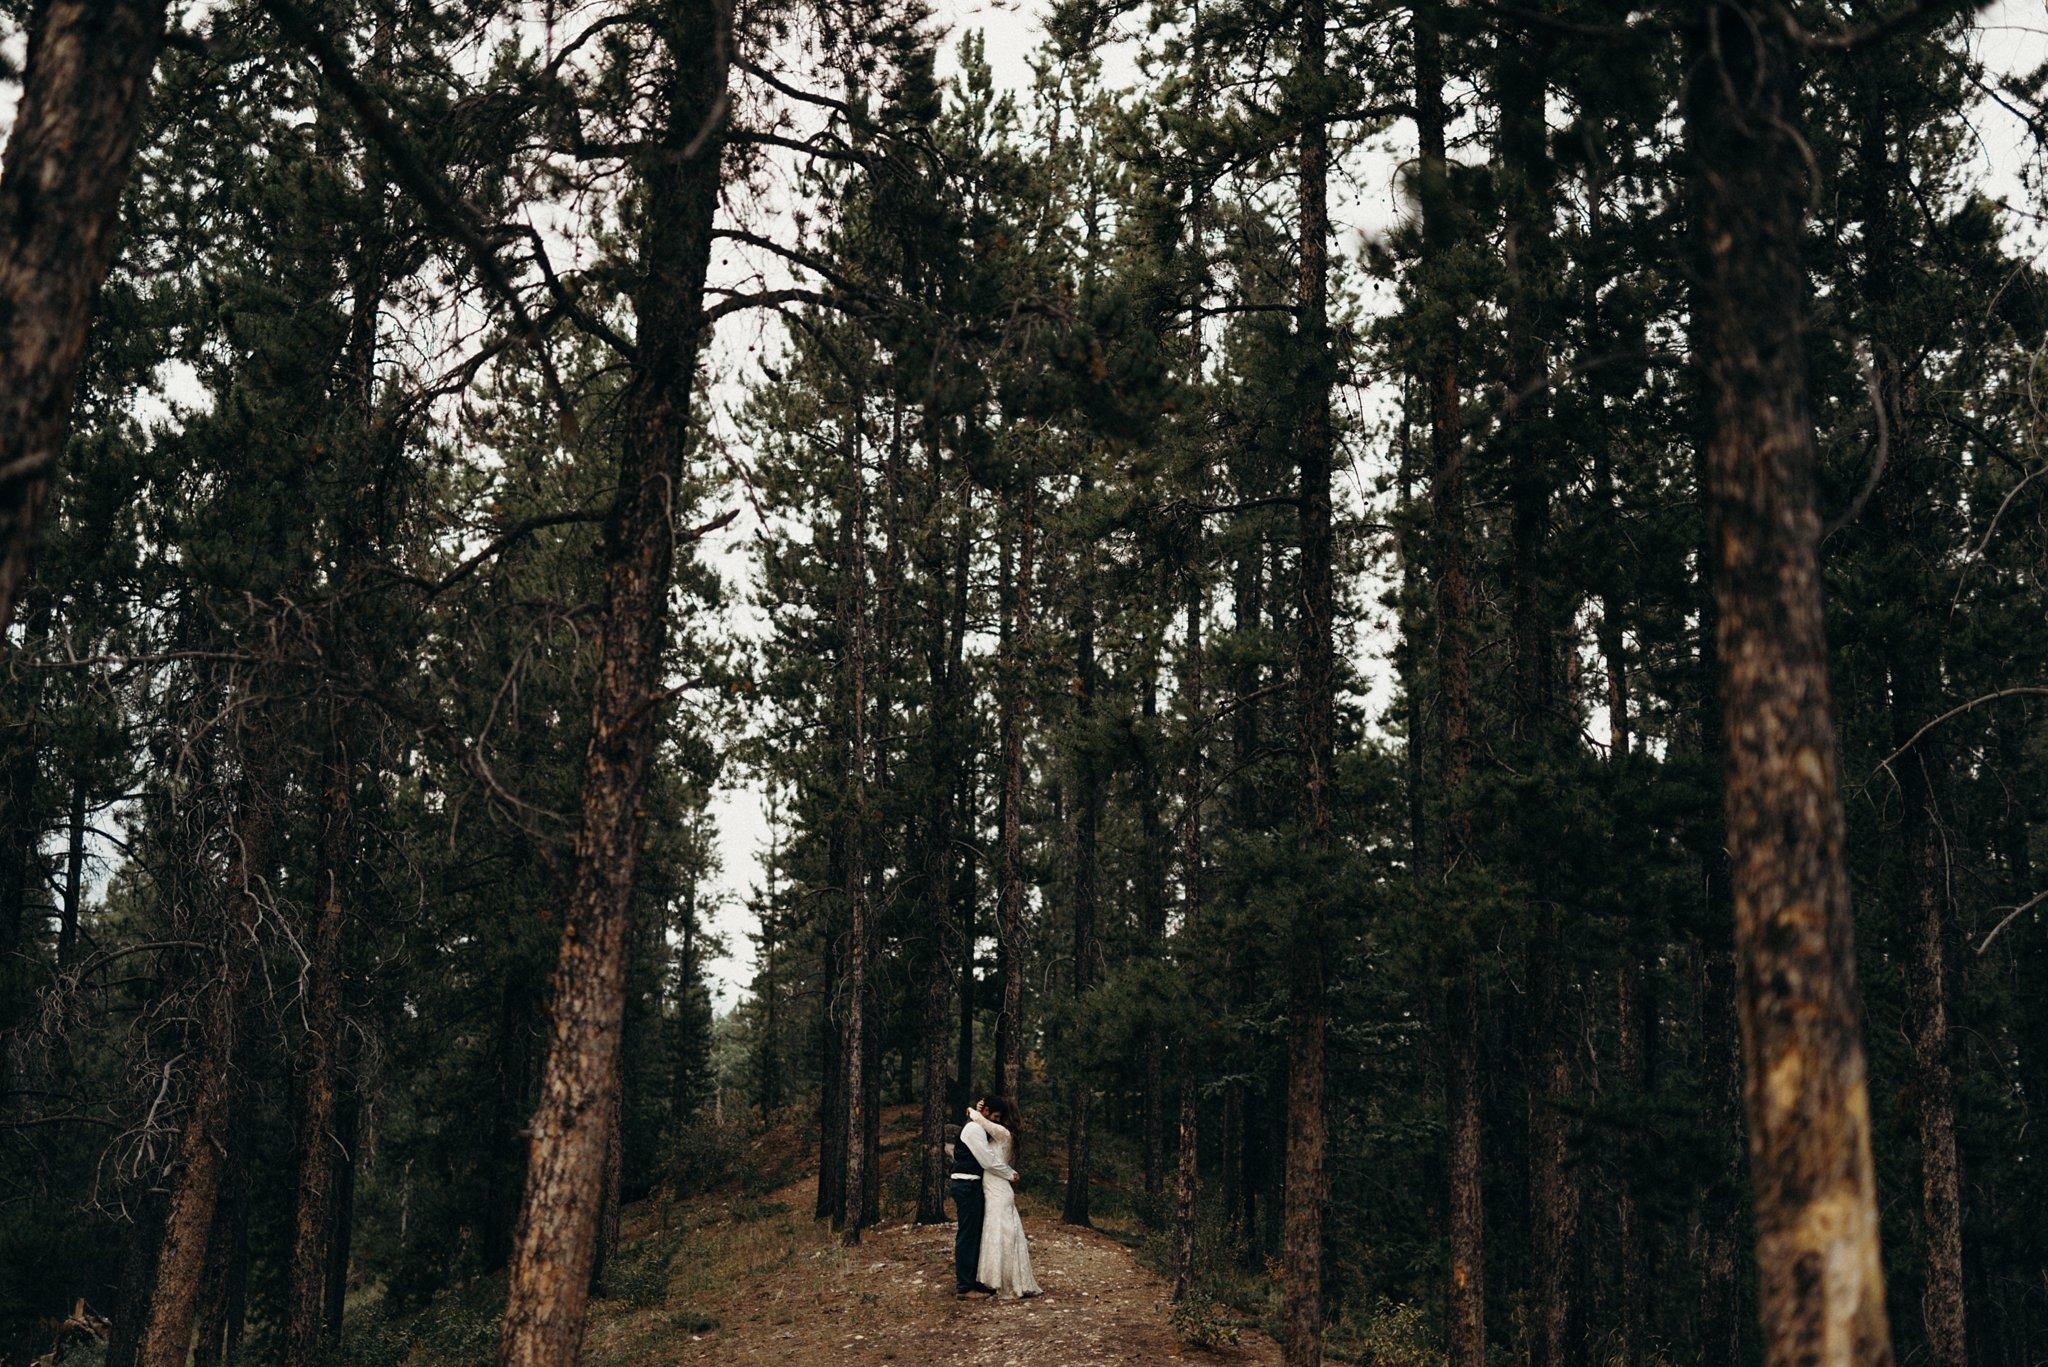 kaihla_tonai_intimate_wedding_elopement_photographer_6741.jpg